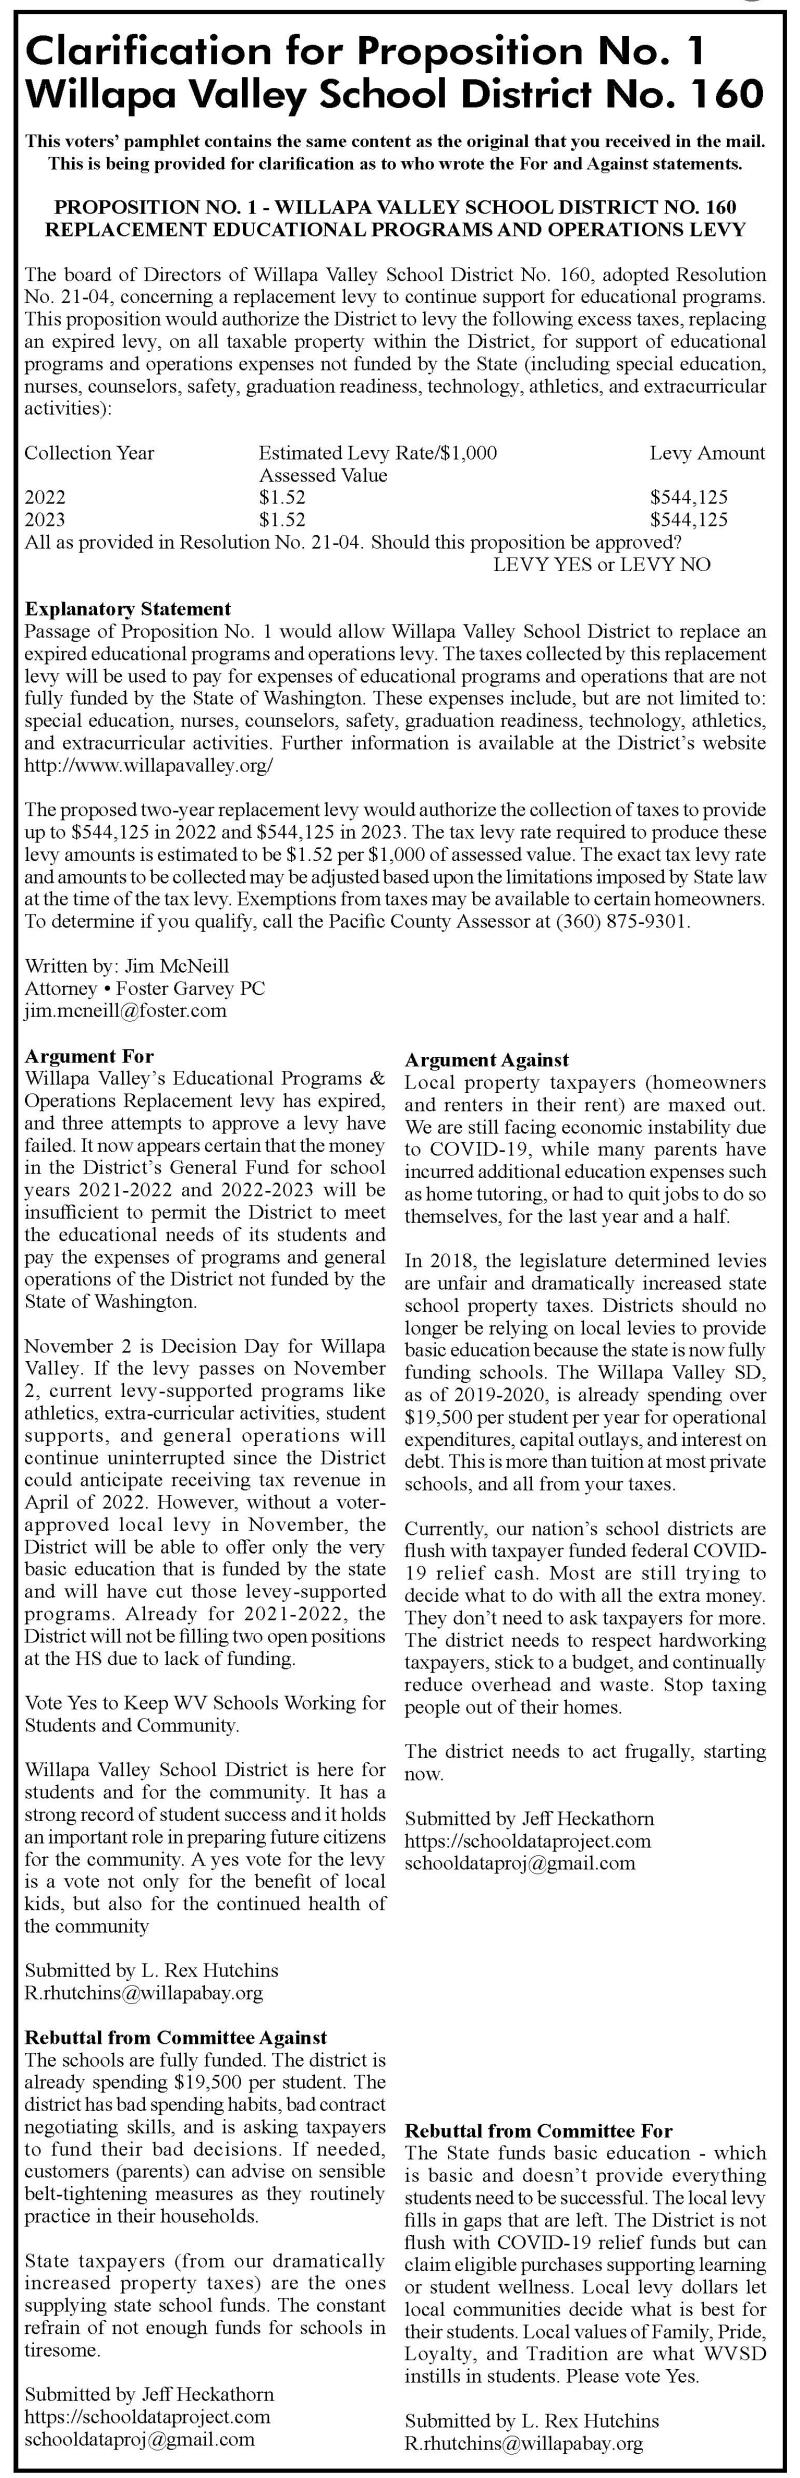 Clarification for Proposition No. 1  Willapa Valley School District No. 160